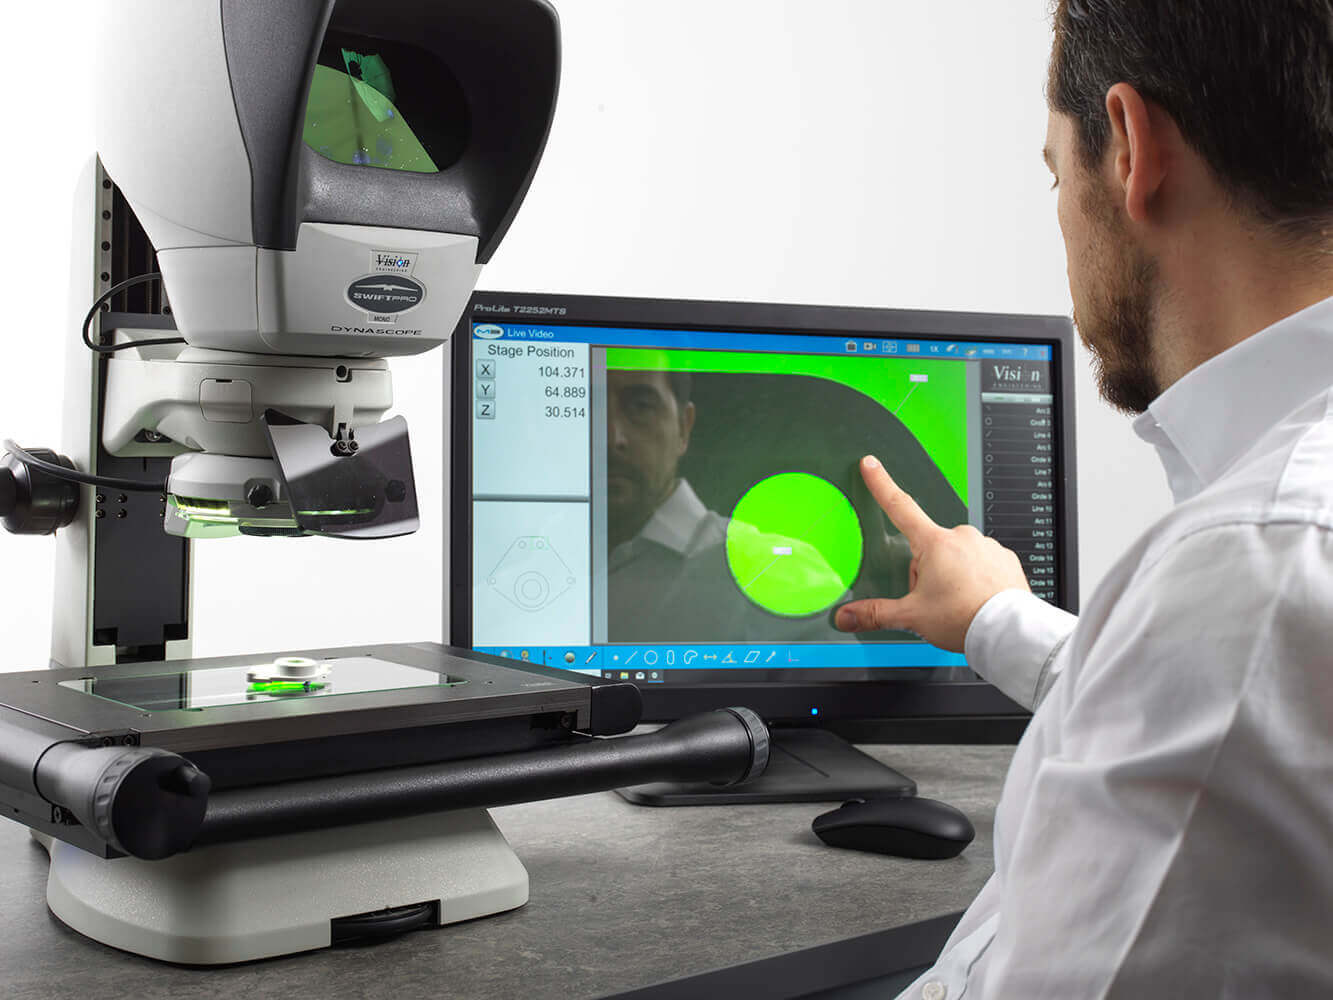 02-Swift-PRO-measuring-microscope-user-AB V19 495